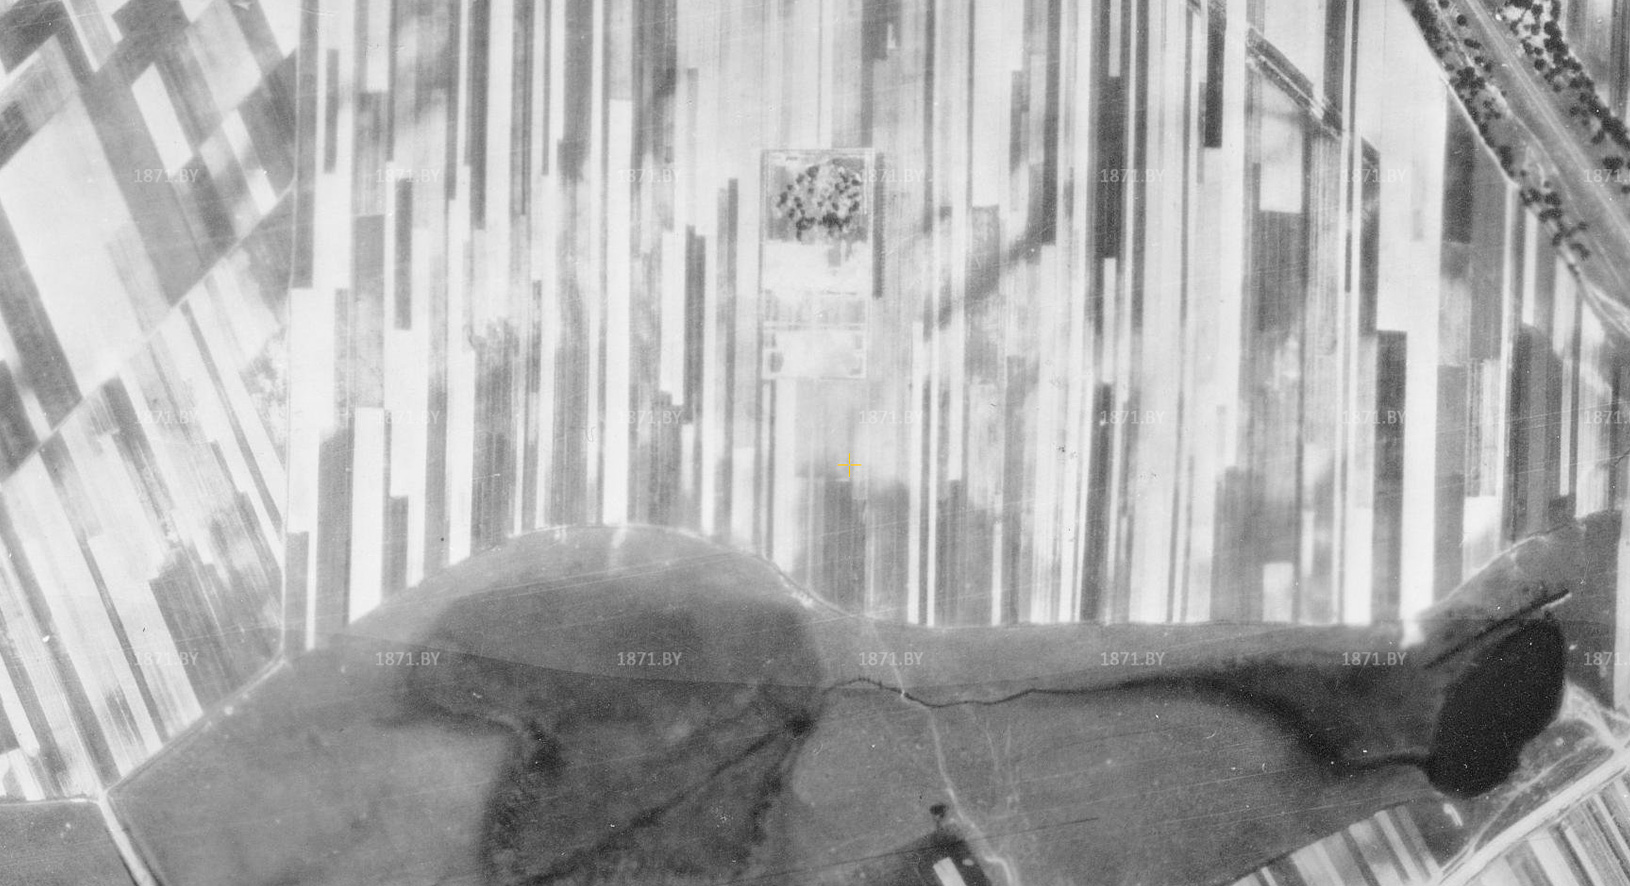 Аэрофотосъемка города Барановичи, 1942